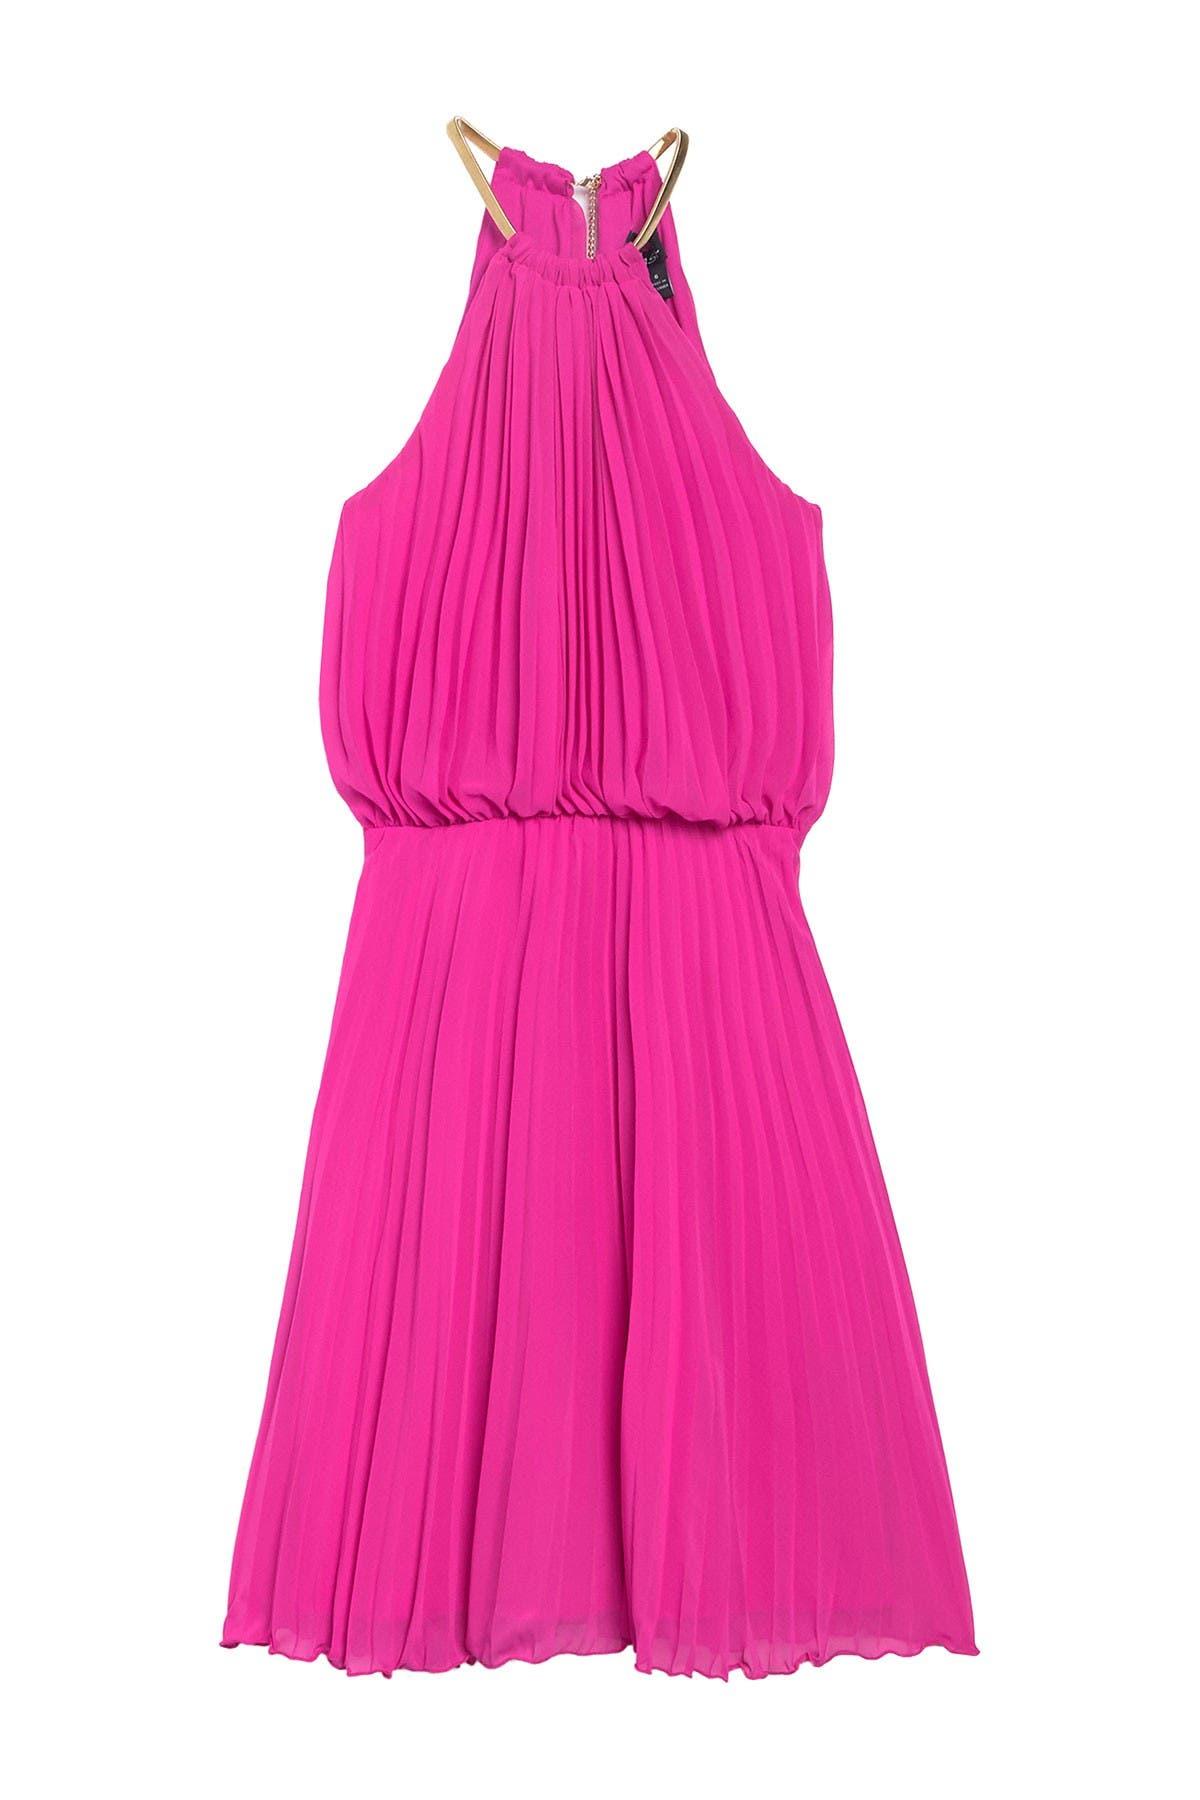 New $229 Msk Women Beige Pink Blue Floral Pleated Halter Cocktail Dress Size 12